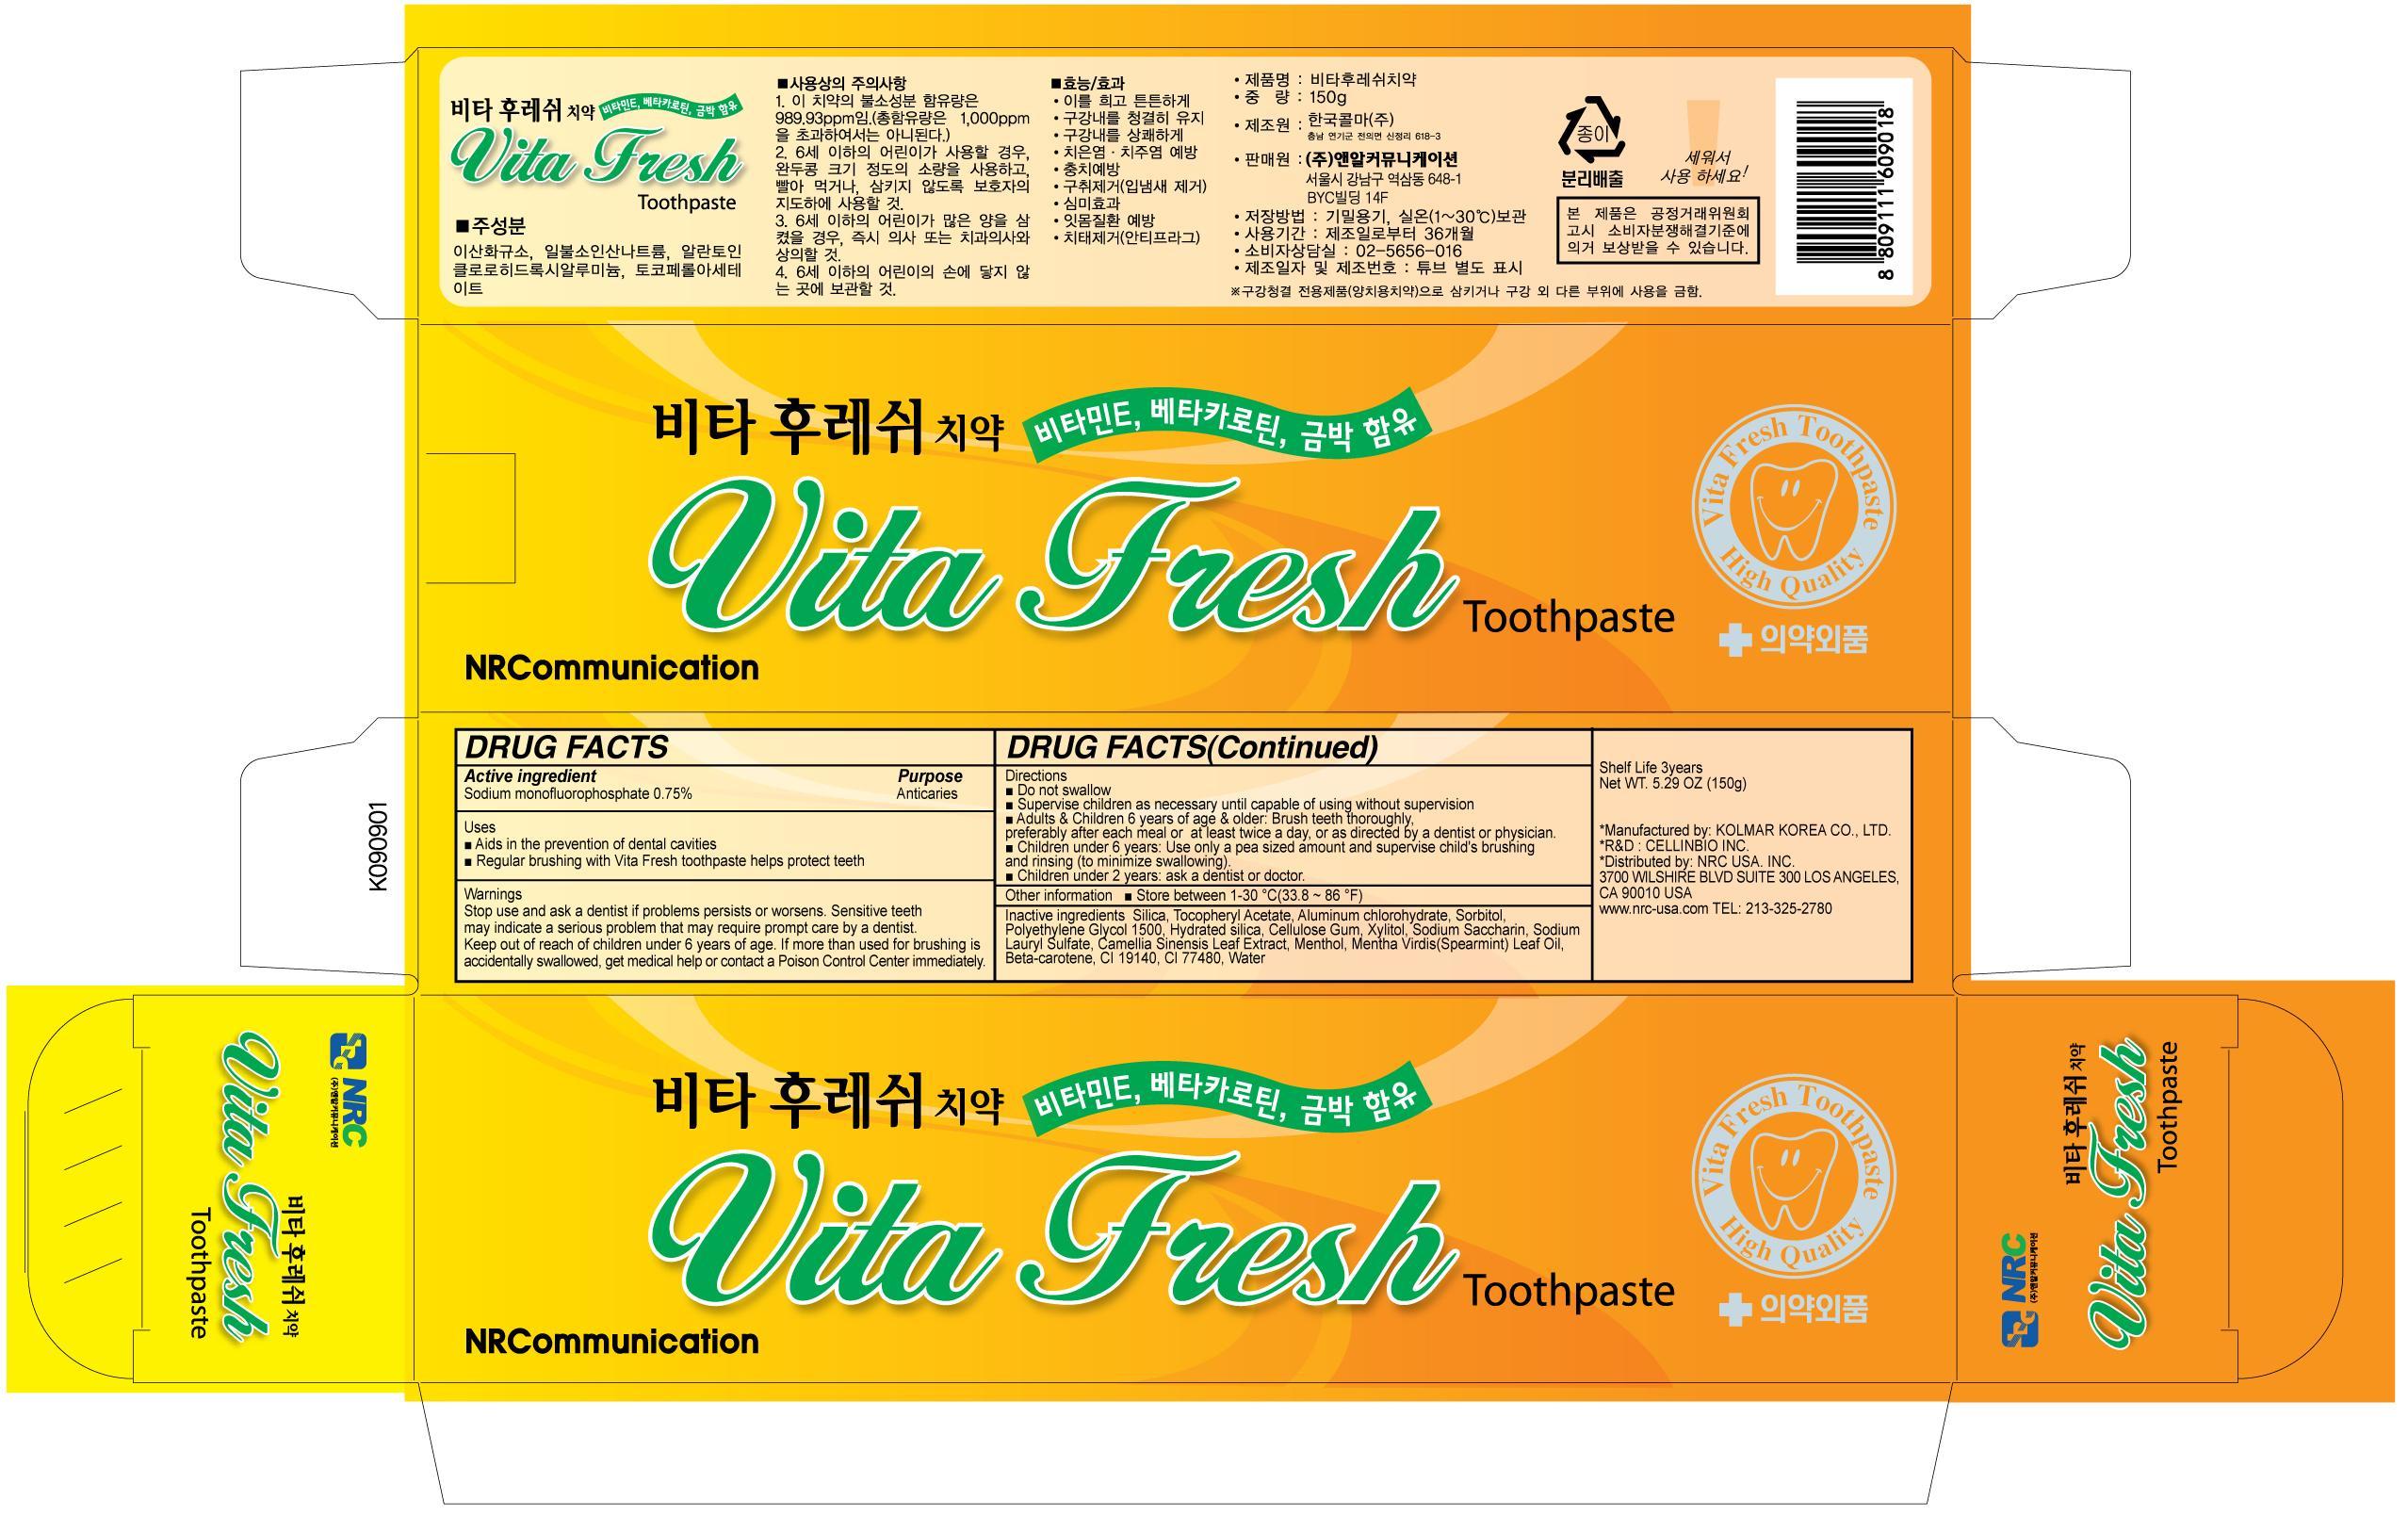 Vita Fresh (Sodium Monofluorophosphate) Paste, Dentifrice [Cellinbio Co Ltd]